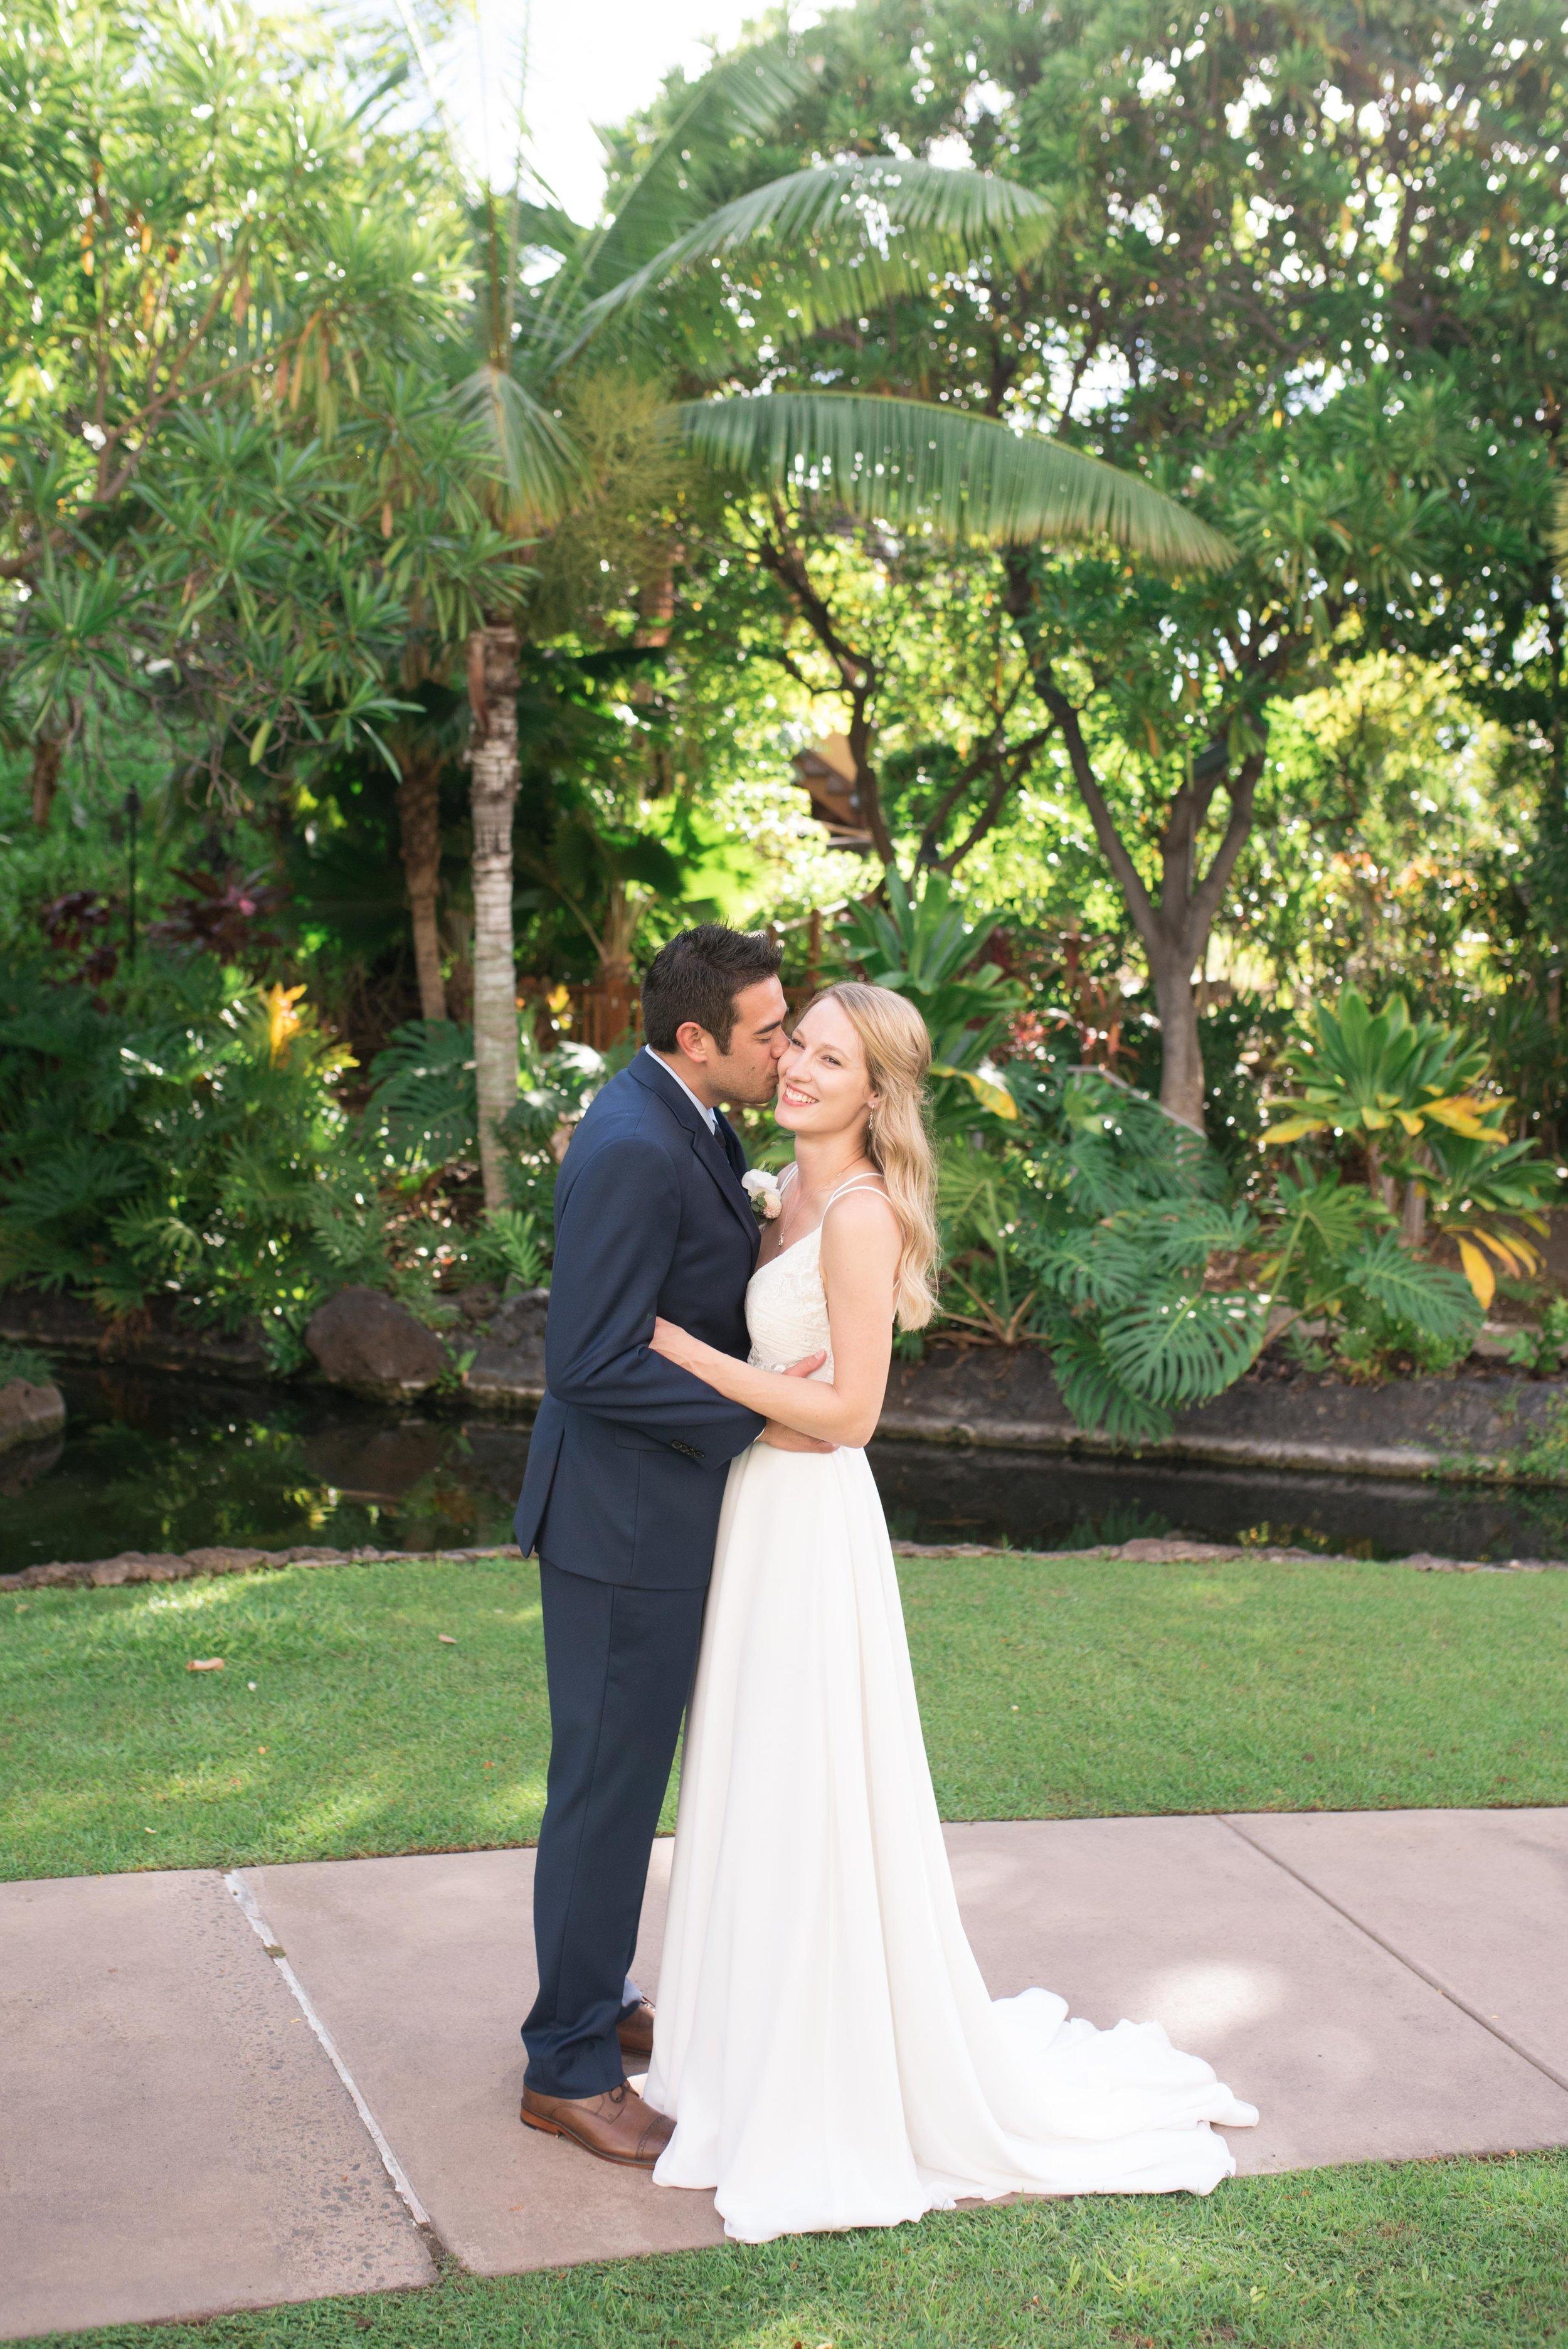 kona hawaii wedding photographer fairmont orchid island beach garden romantic portraits kayla kitts